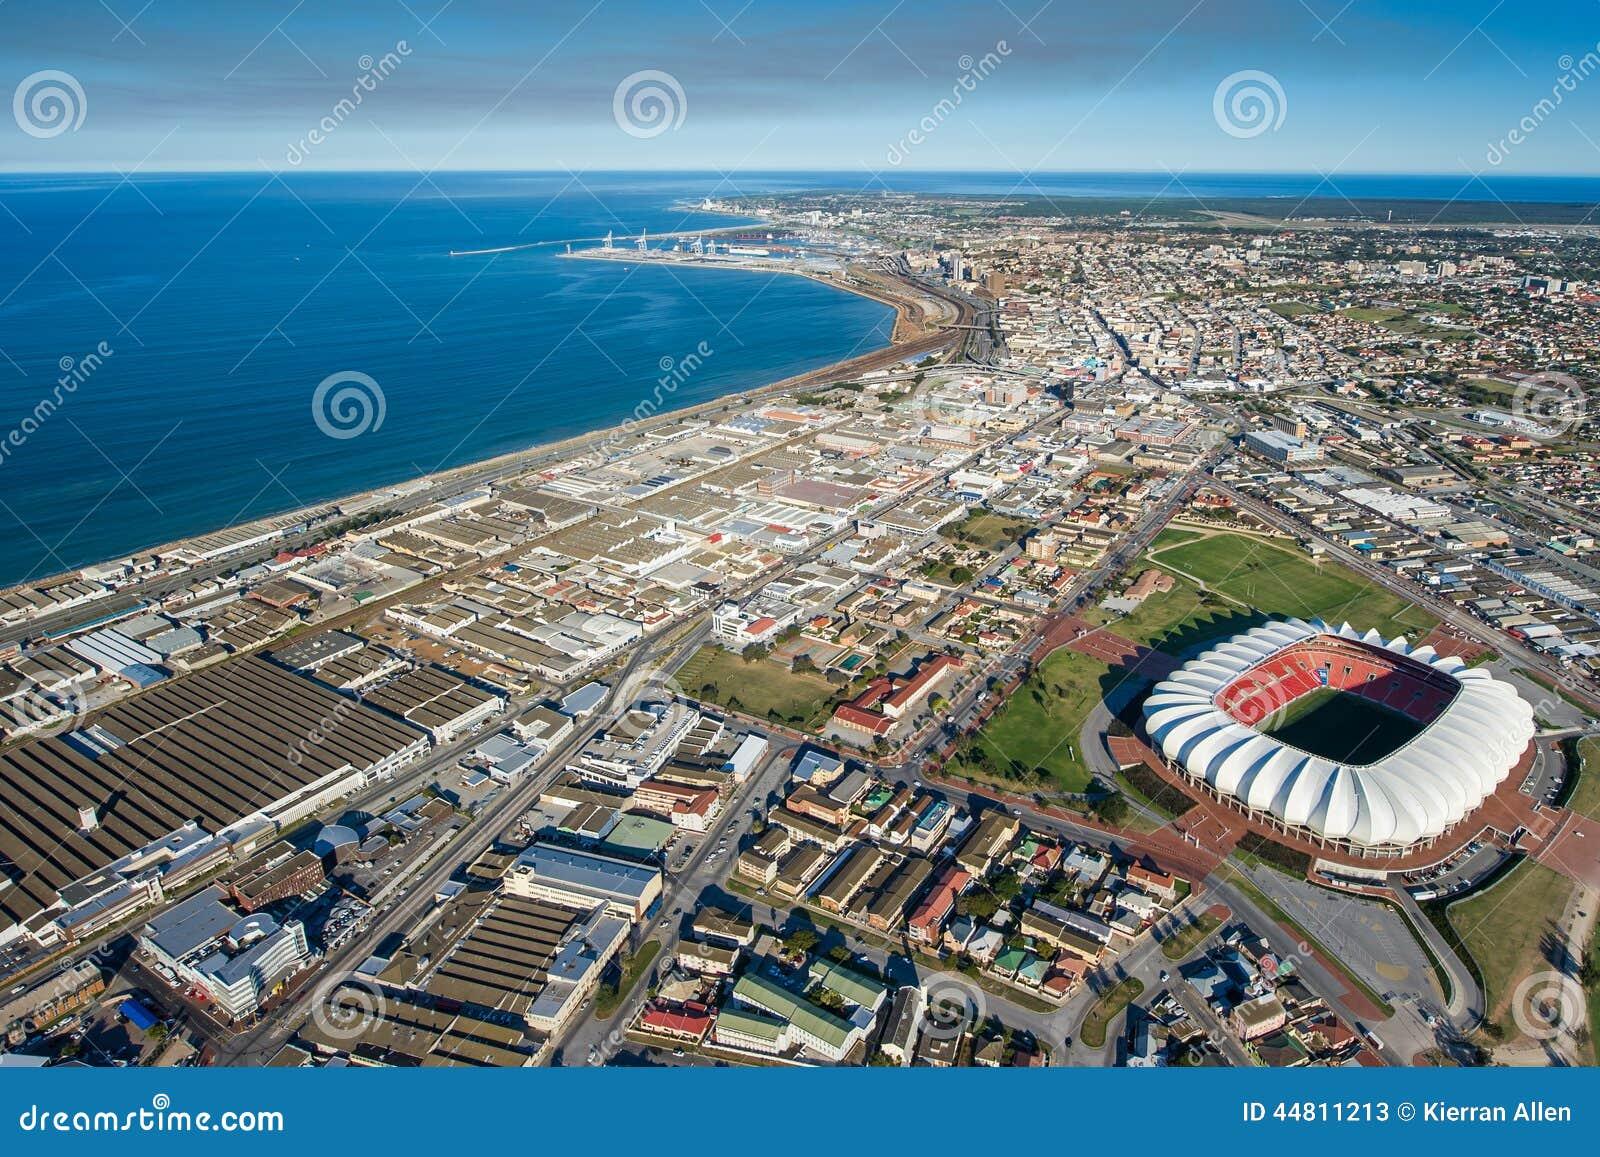 Aerial of port elizabeth south africa stock photo image - Population of port elizabeth south africa ...